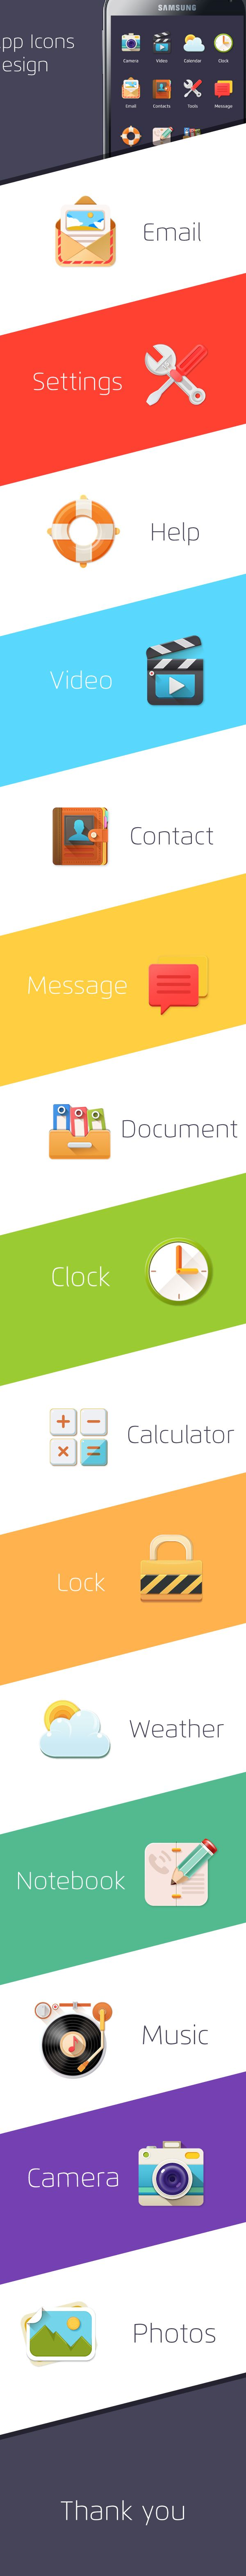 App Icons Design on Behance